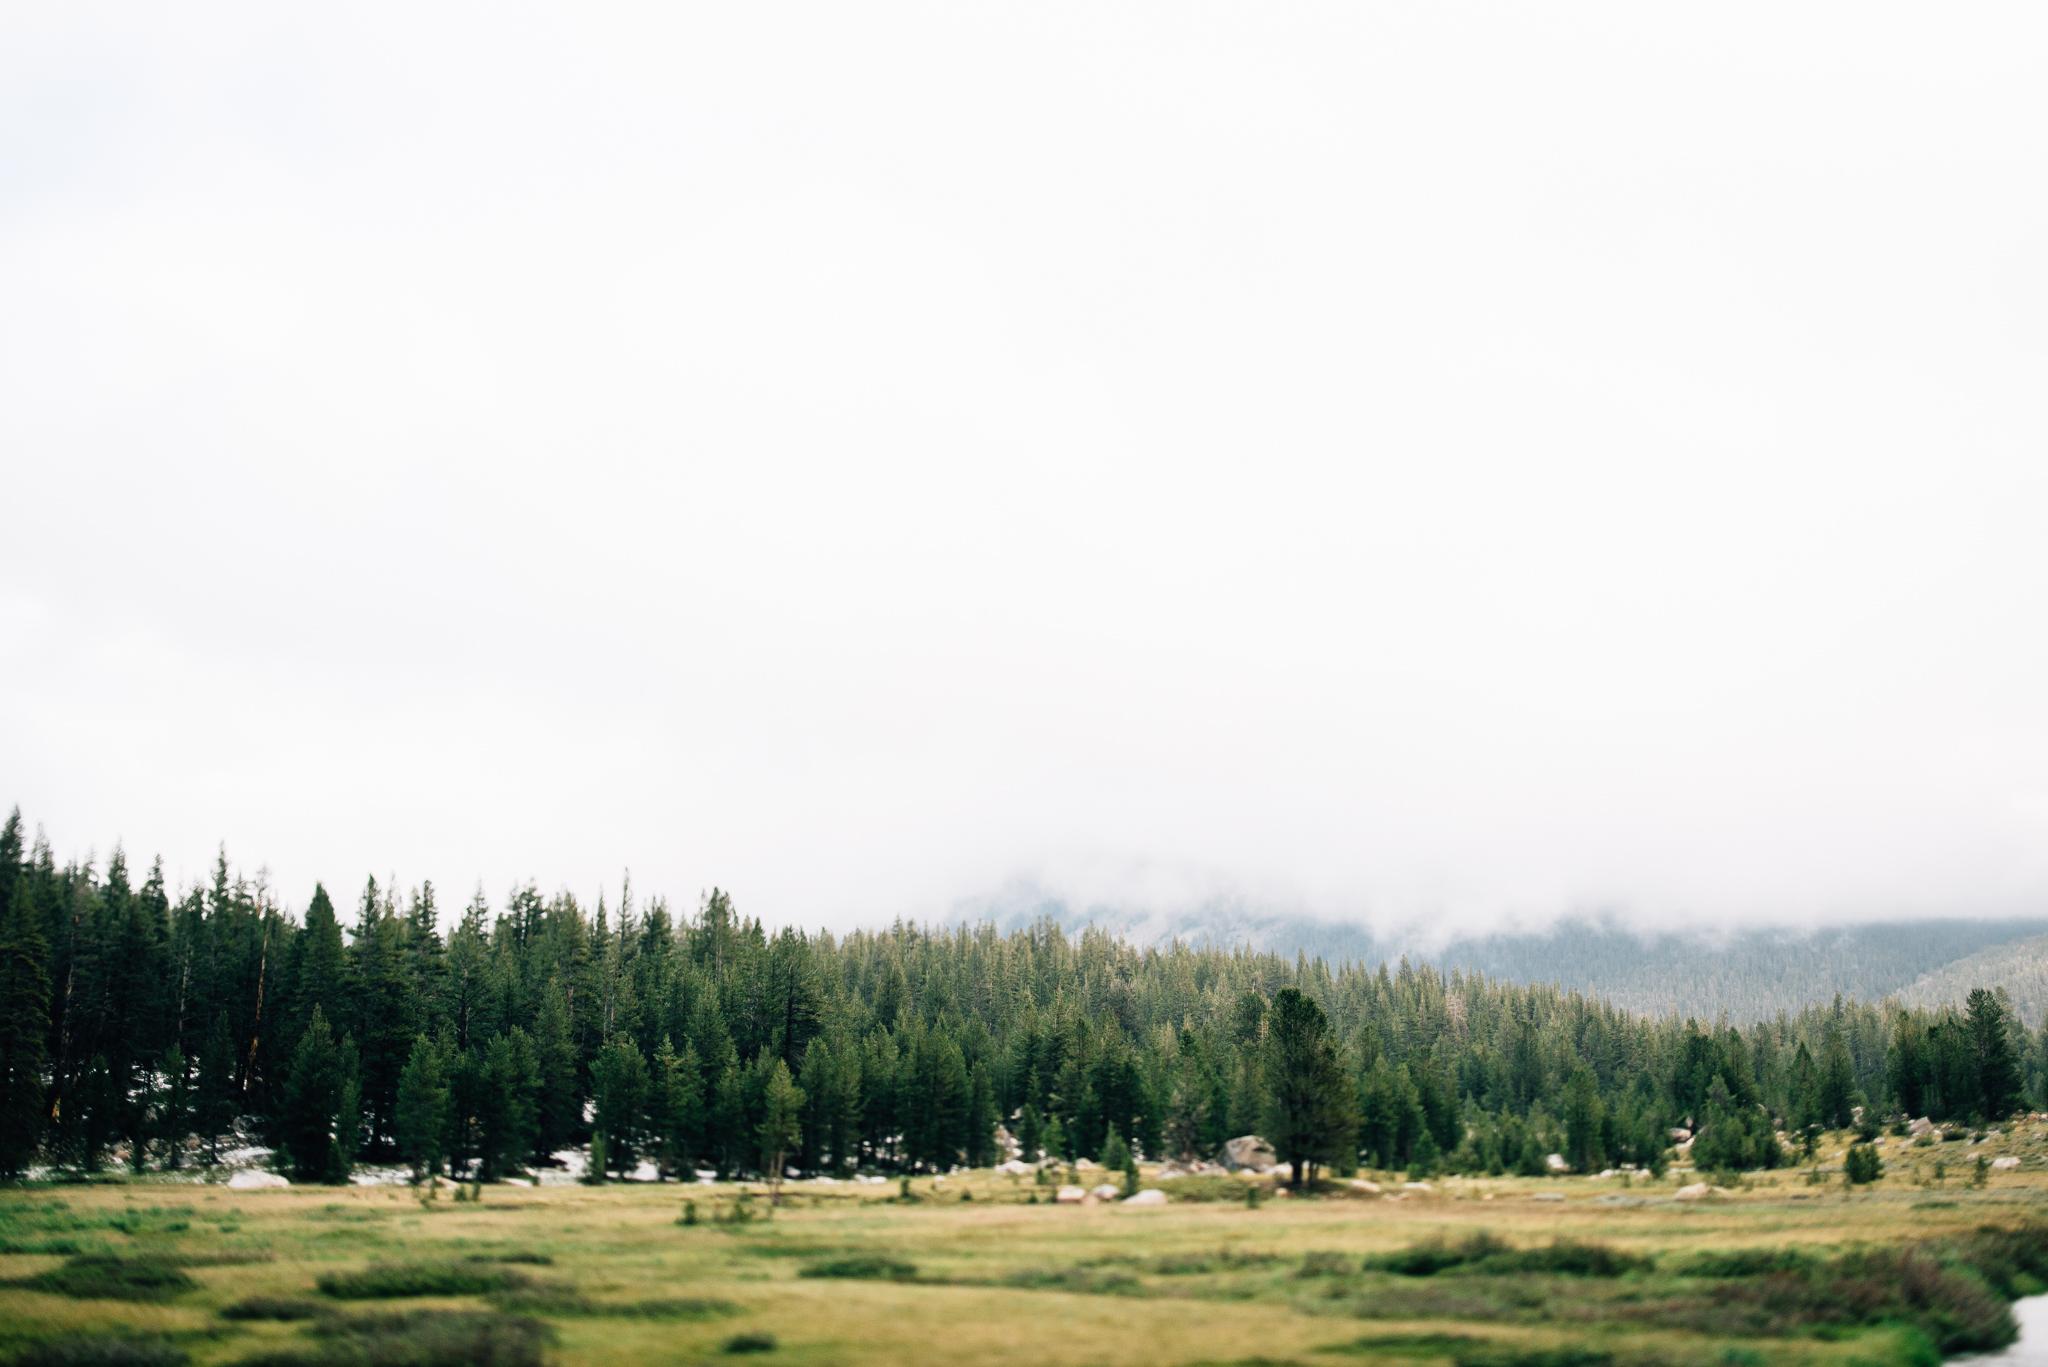 ©The Ryans Photography - Los Angeles Travel - Tuolomne Meadows Yosemite-014.jpg